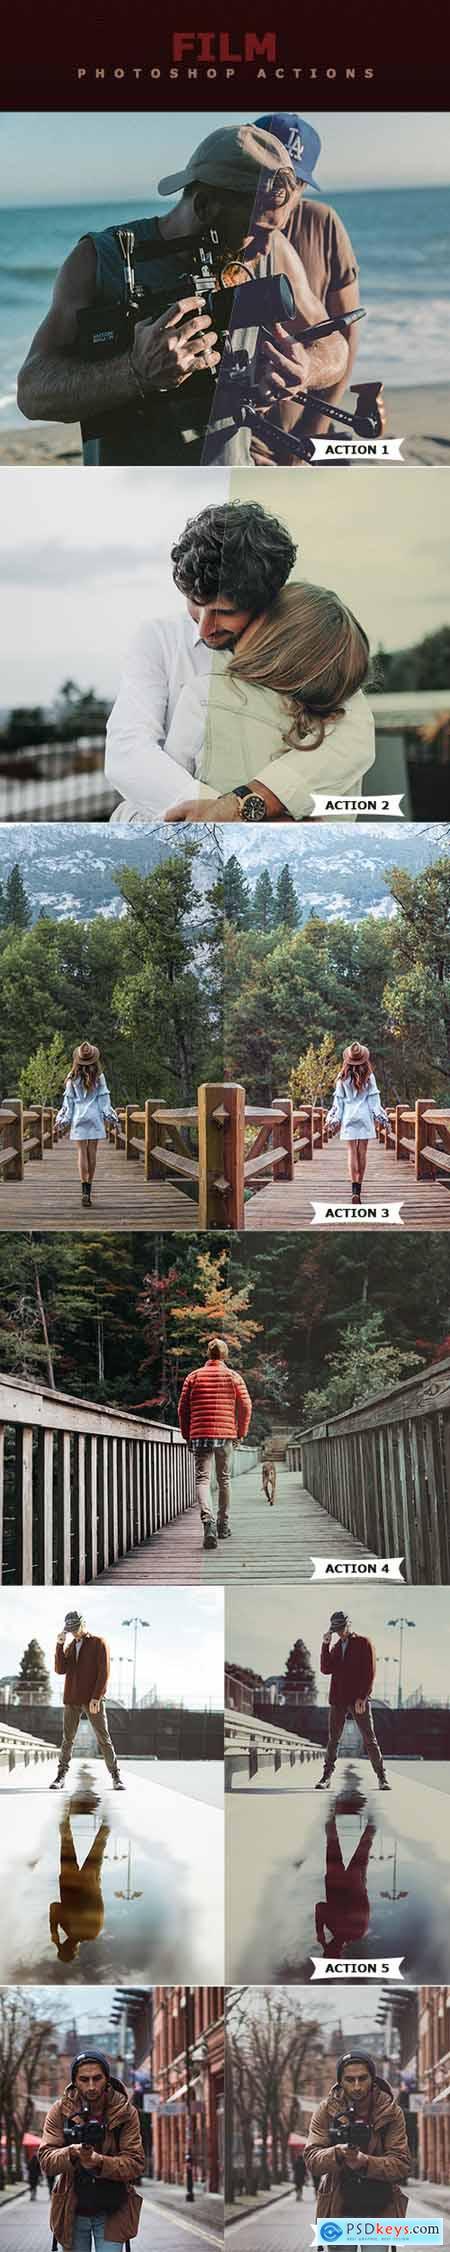 Film Photoshop Actions 22824285